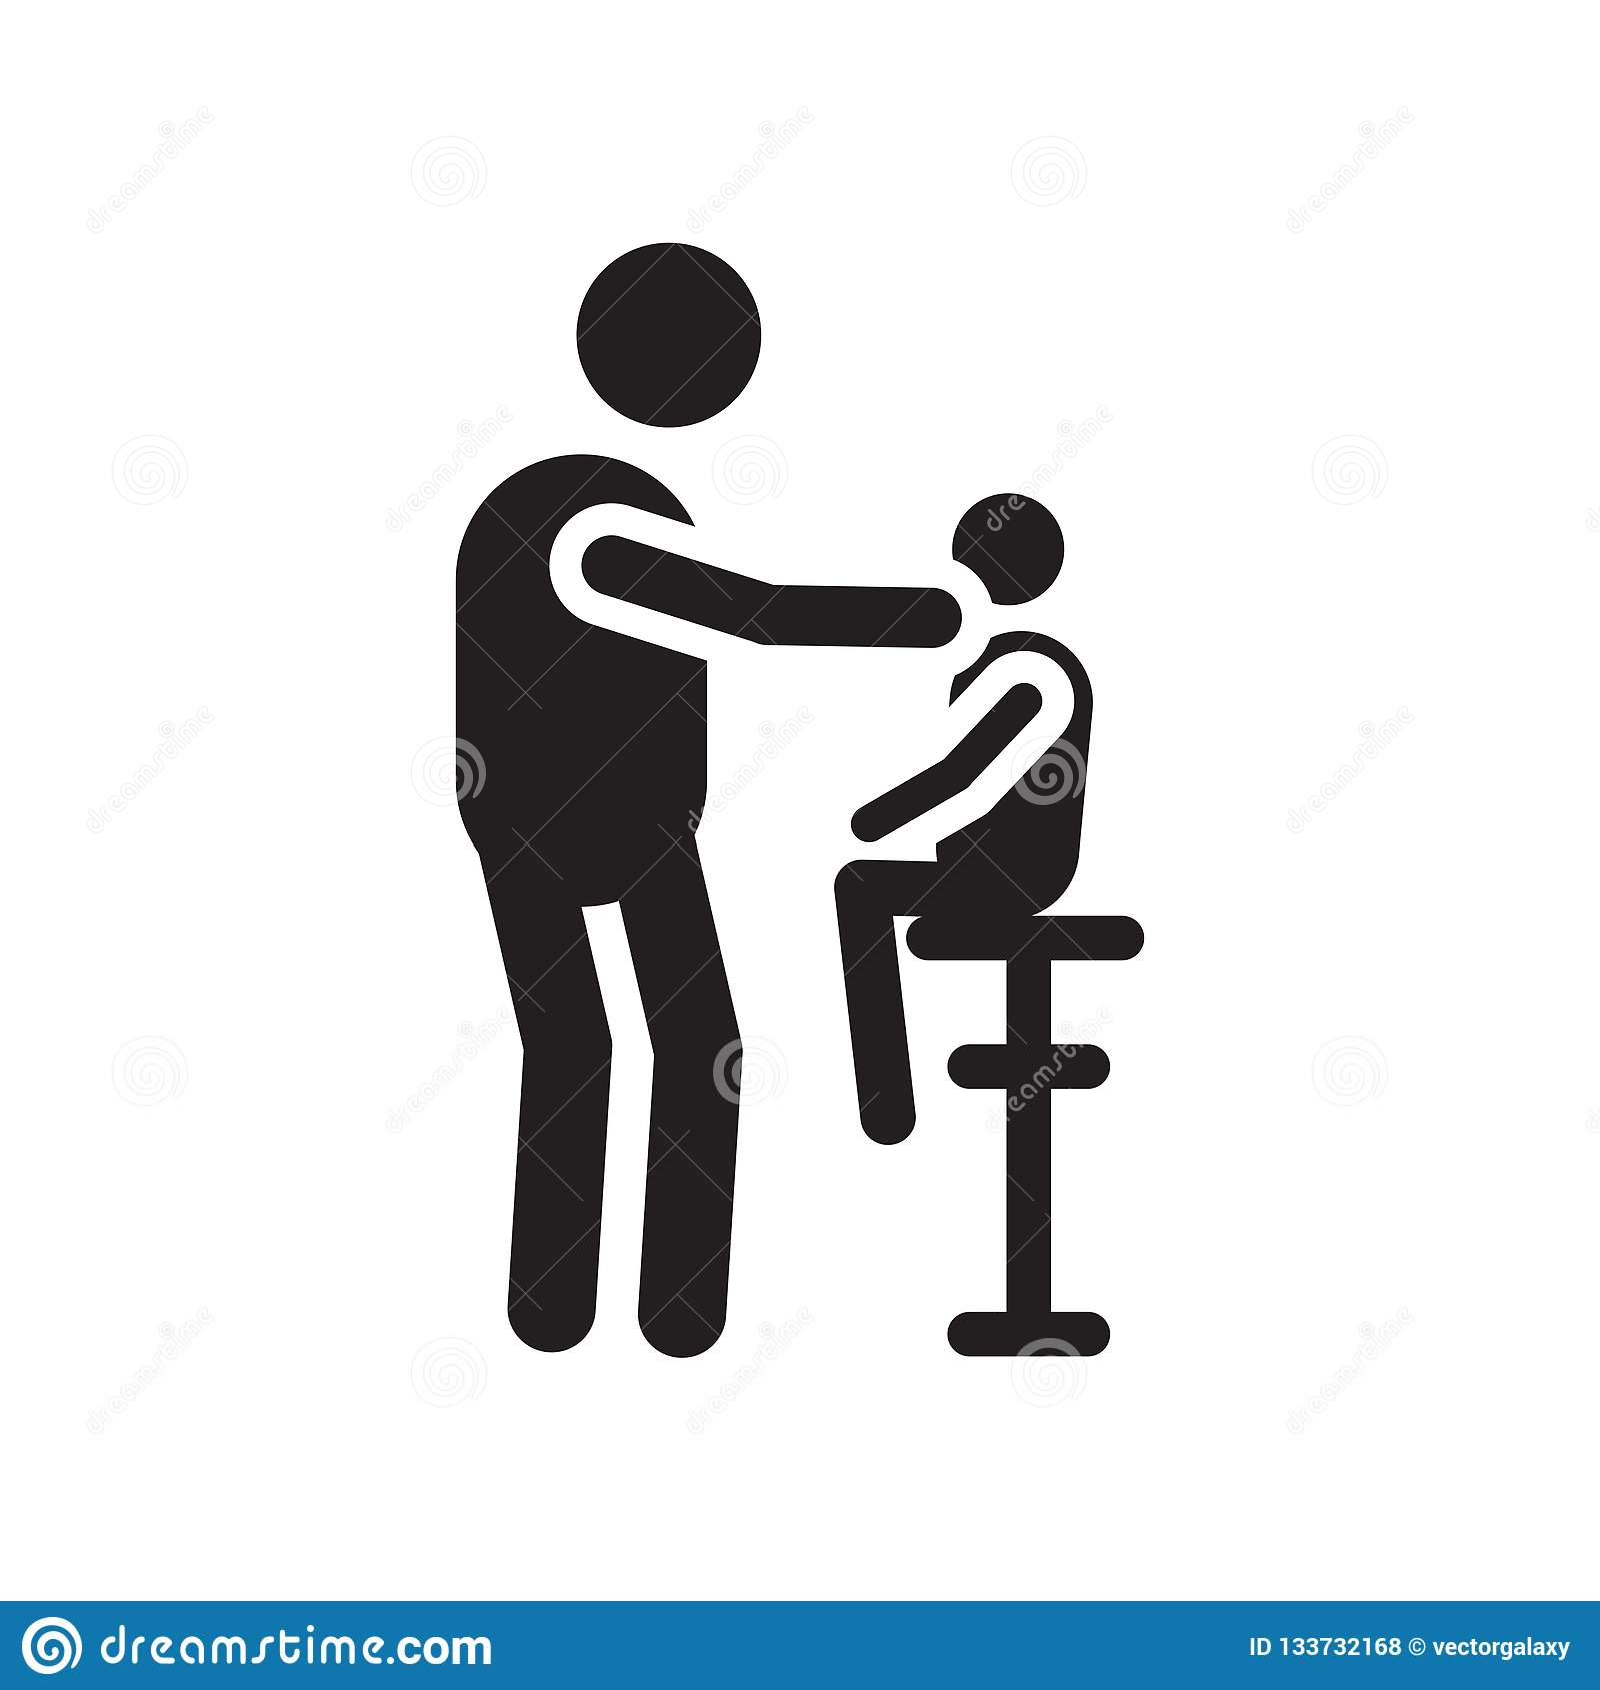 Pediatrics And Pediatrician Medical Symbol Stock Photo ...